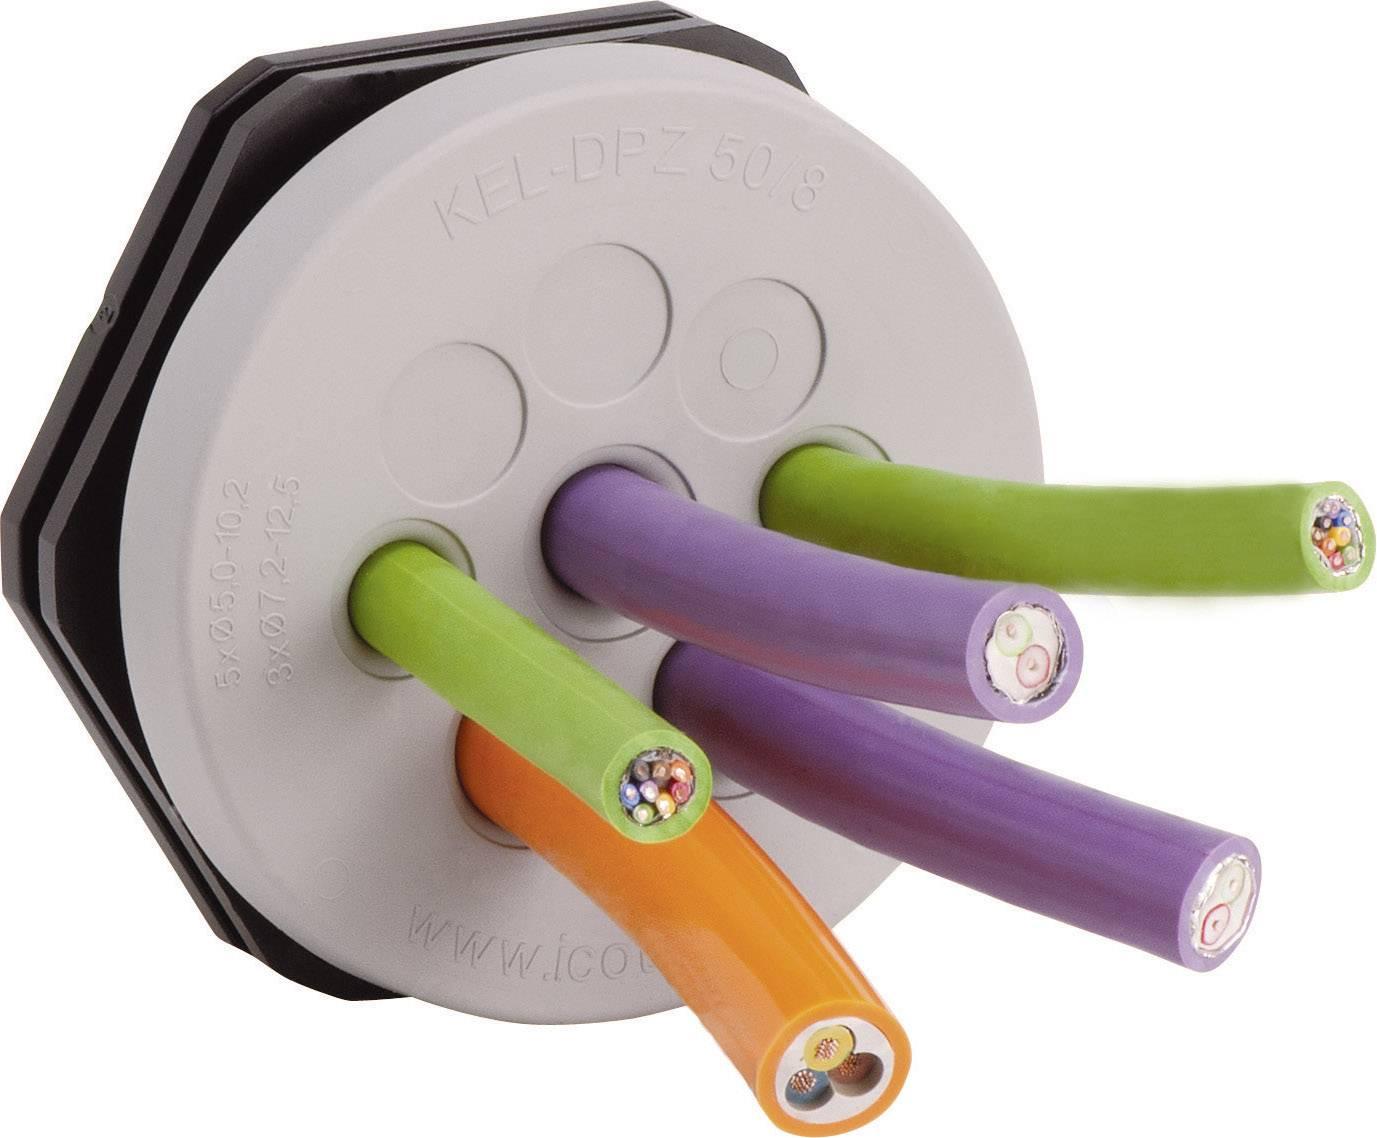 Icotek Uvodnica za kable KEL-DPZ okrogla KEL-DPZ 50|8 velikost: M50 poliamid/elastomer, siva